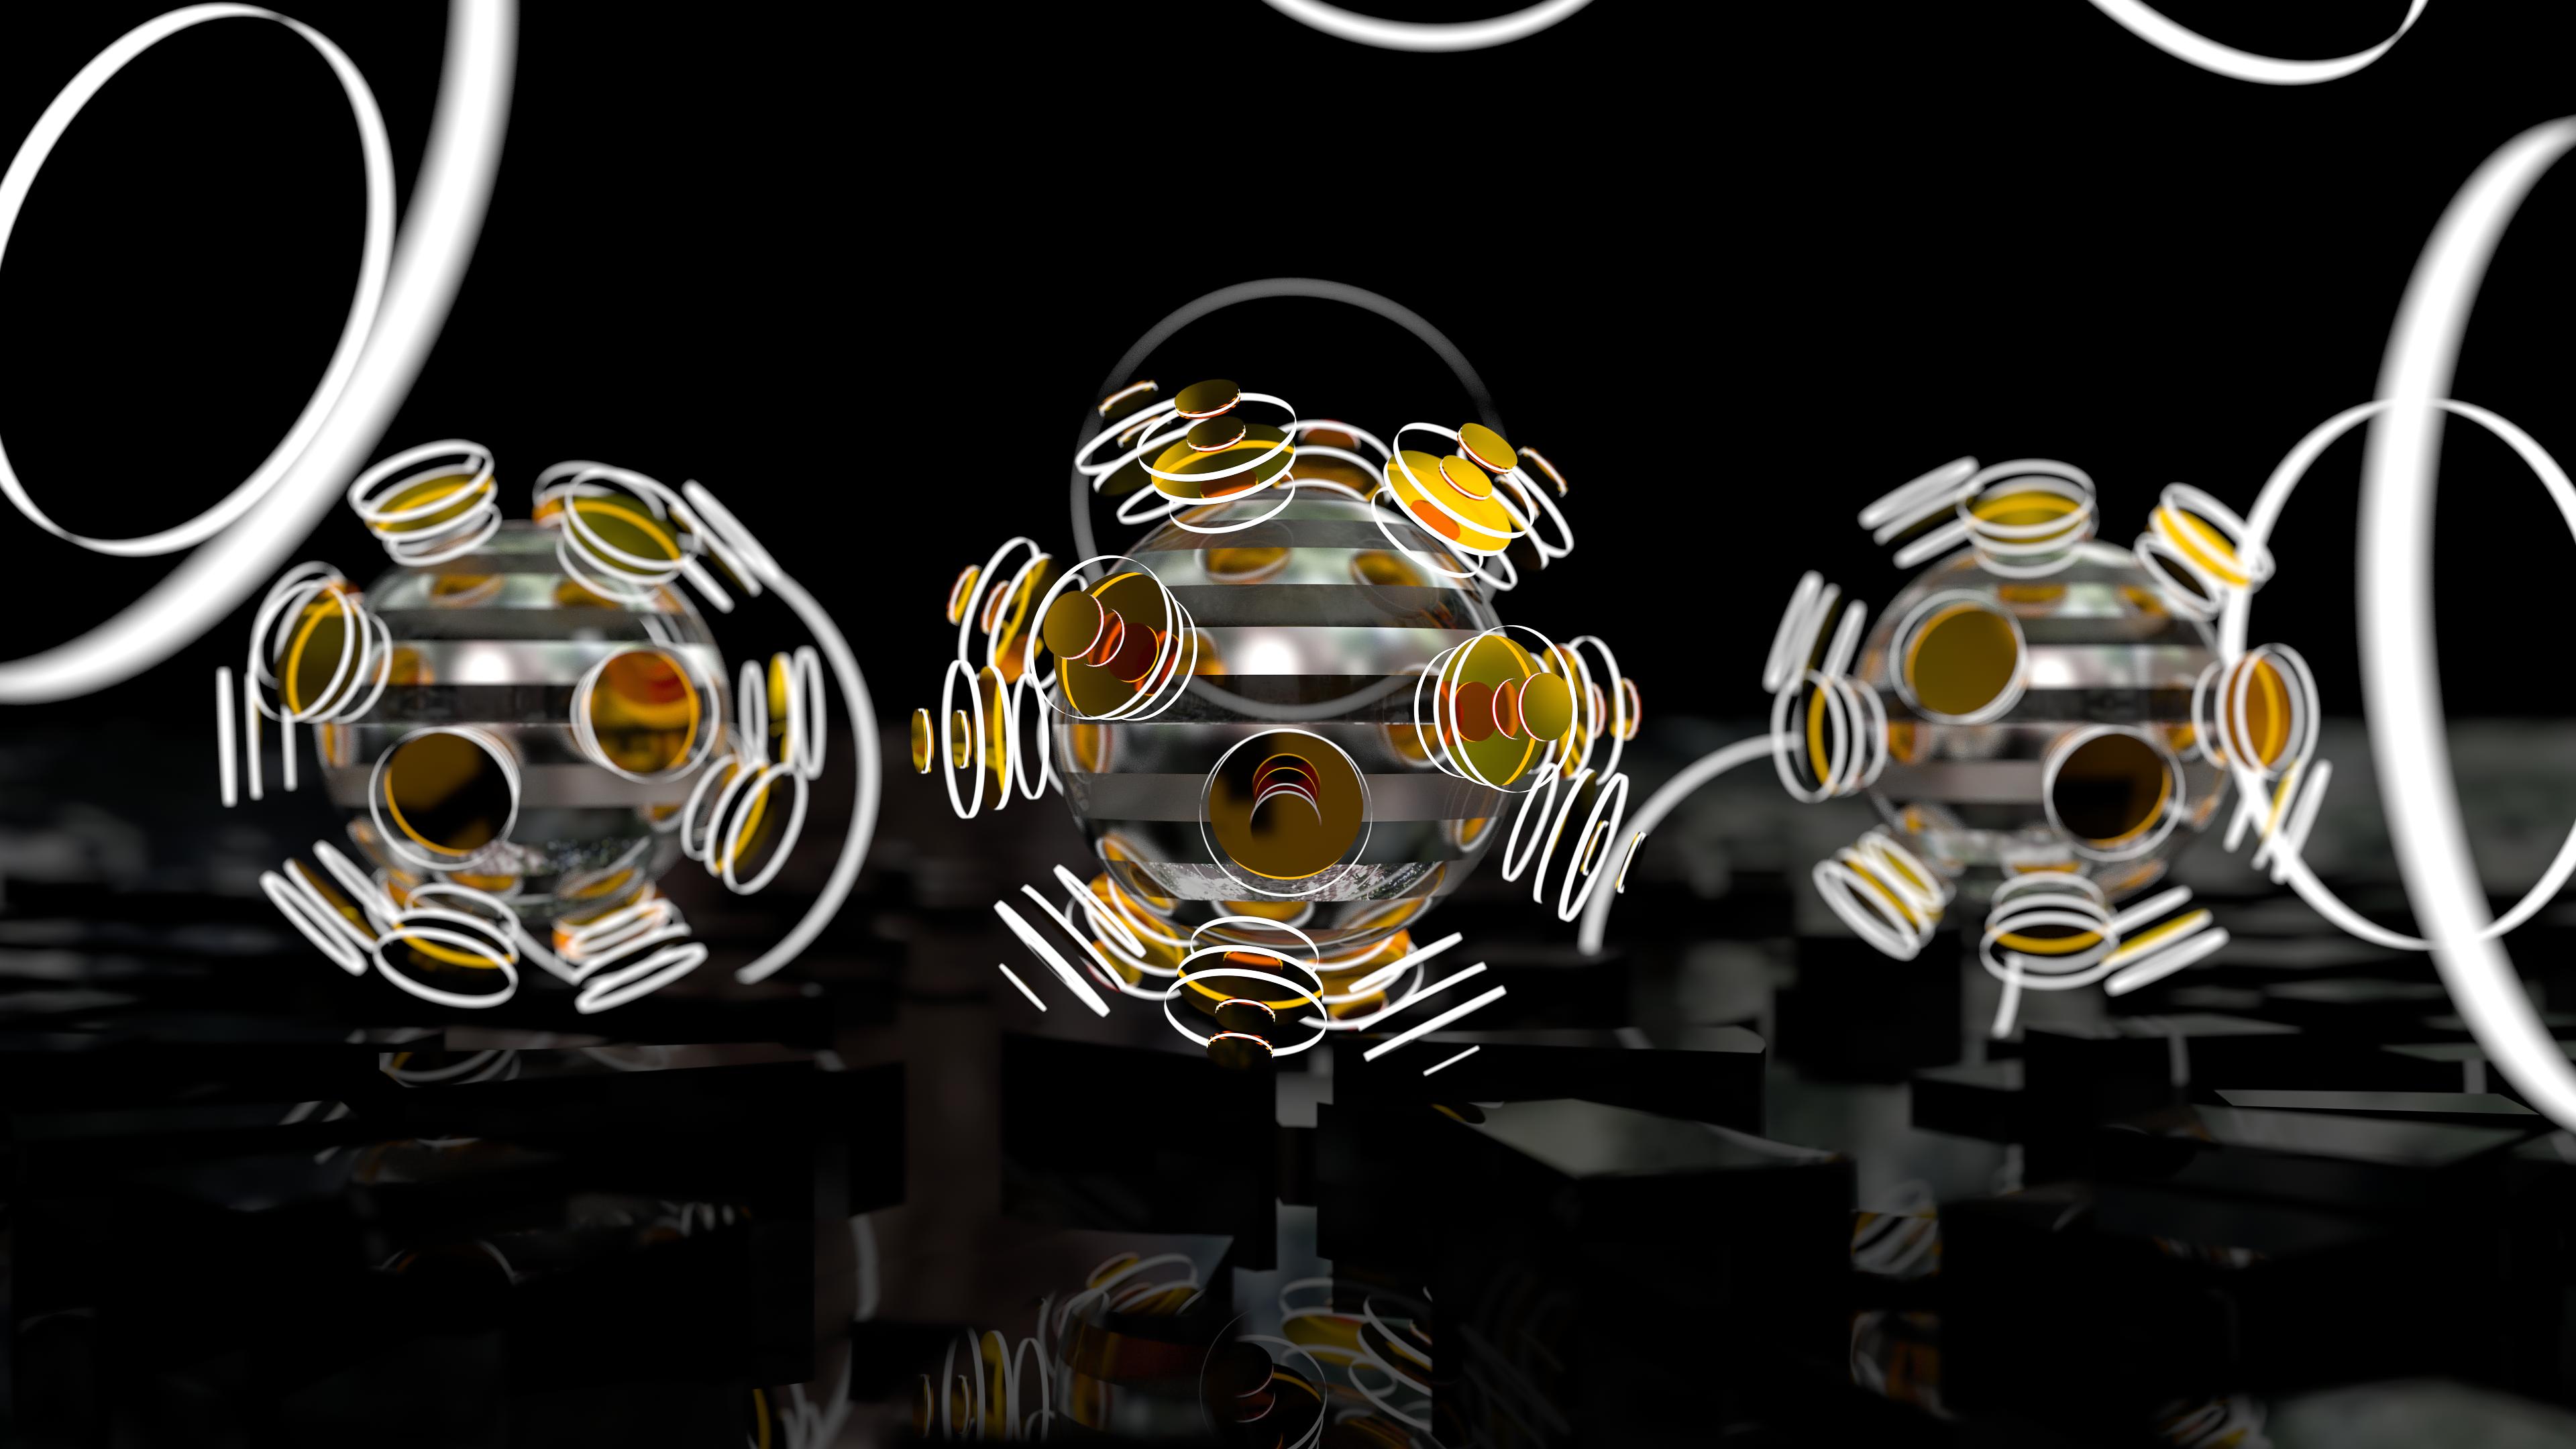 focused_spheres___wallpaper_pack__4k_and_full_hd__by_dario999-d6m4l99